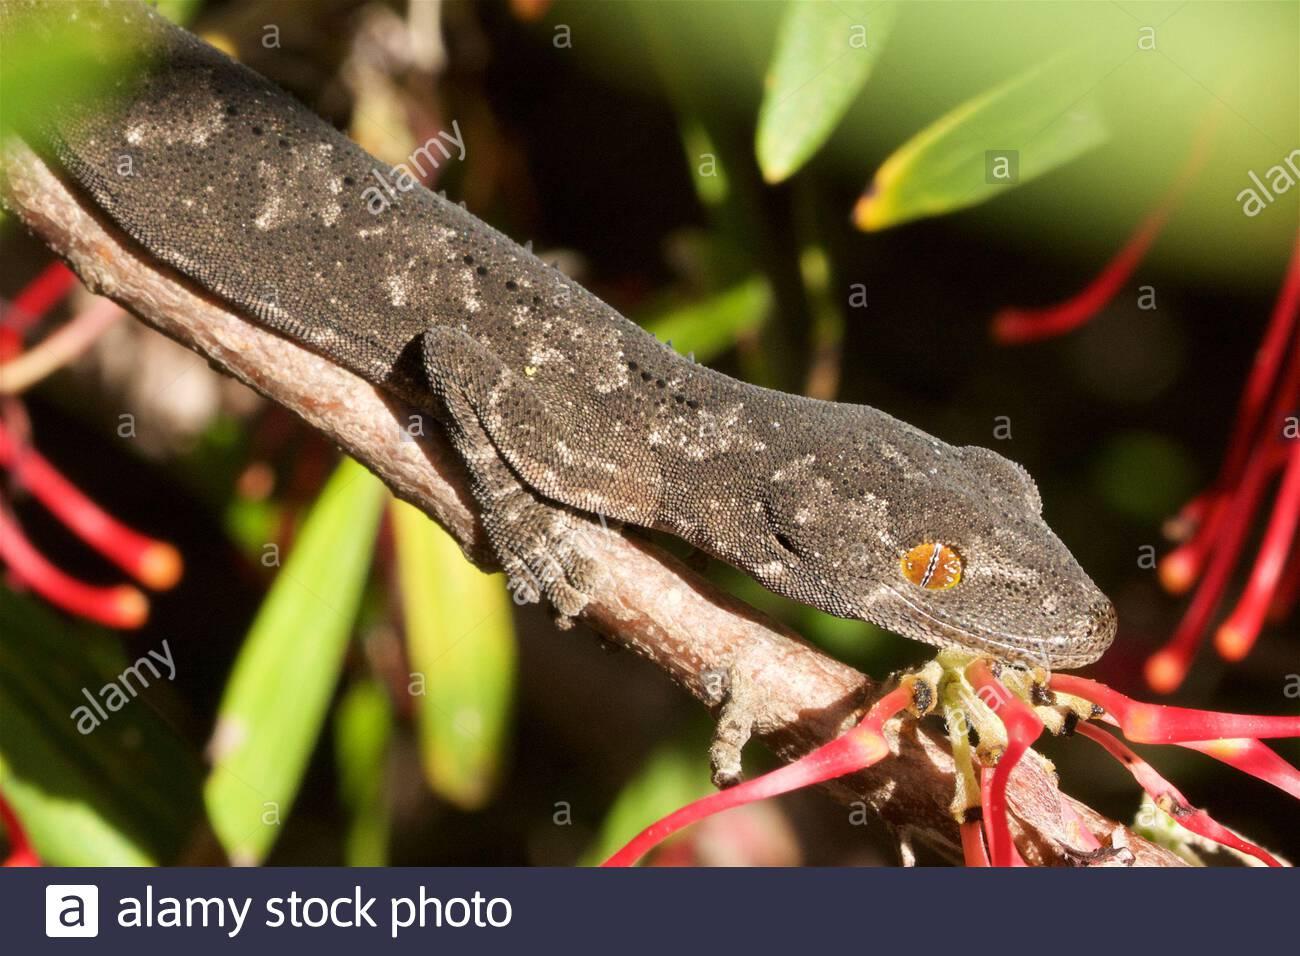 a-south-western-spiny-tailed-gecko-strophurus-spinigerus-in-perth-western-australia-2CA0758.jpg